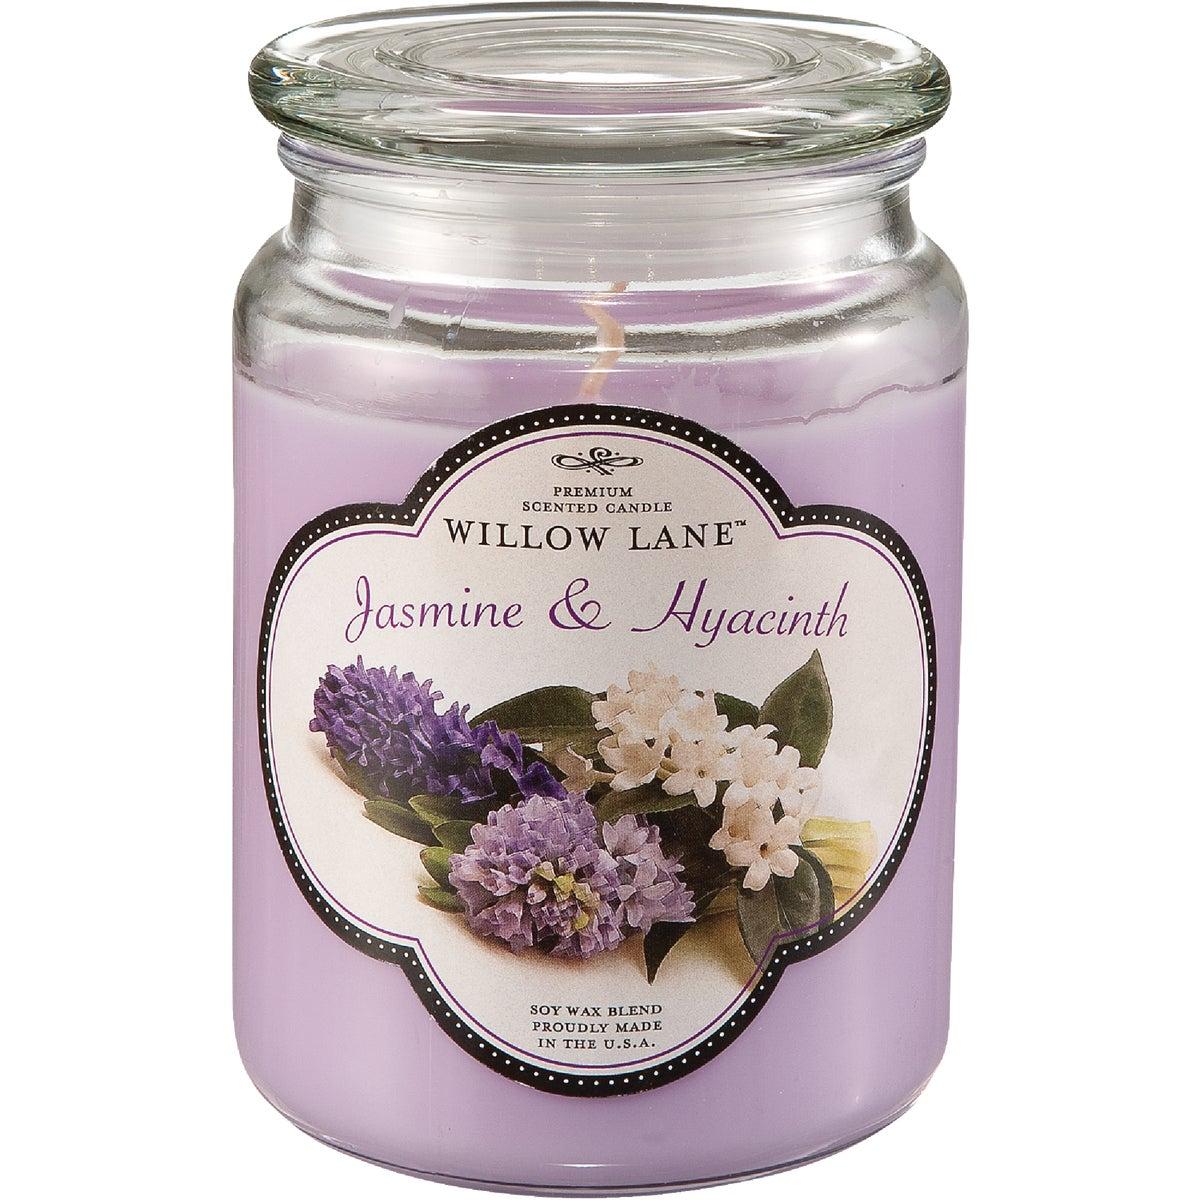 JASMIN/HYACIN JAR CANDLE - 1646622 by Candle Lite Co